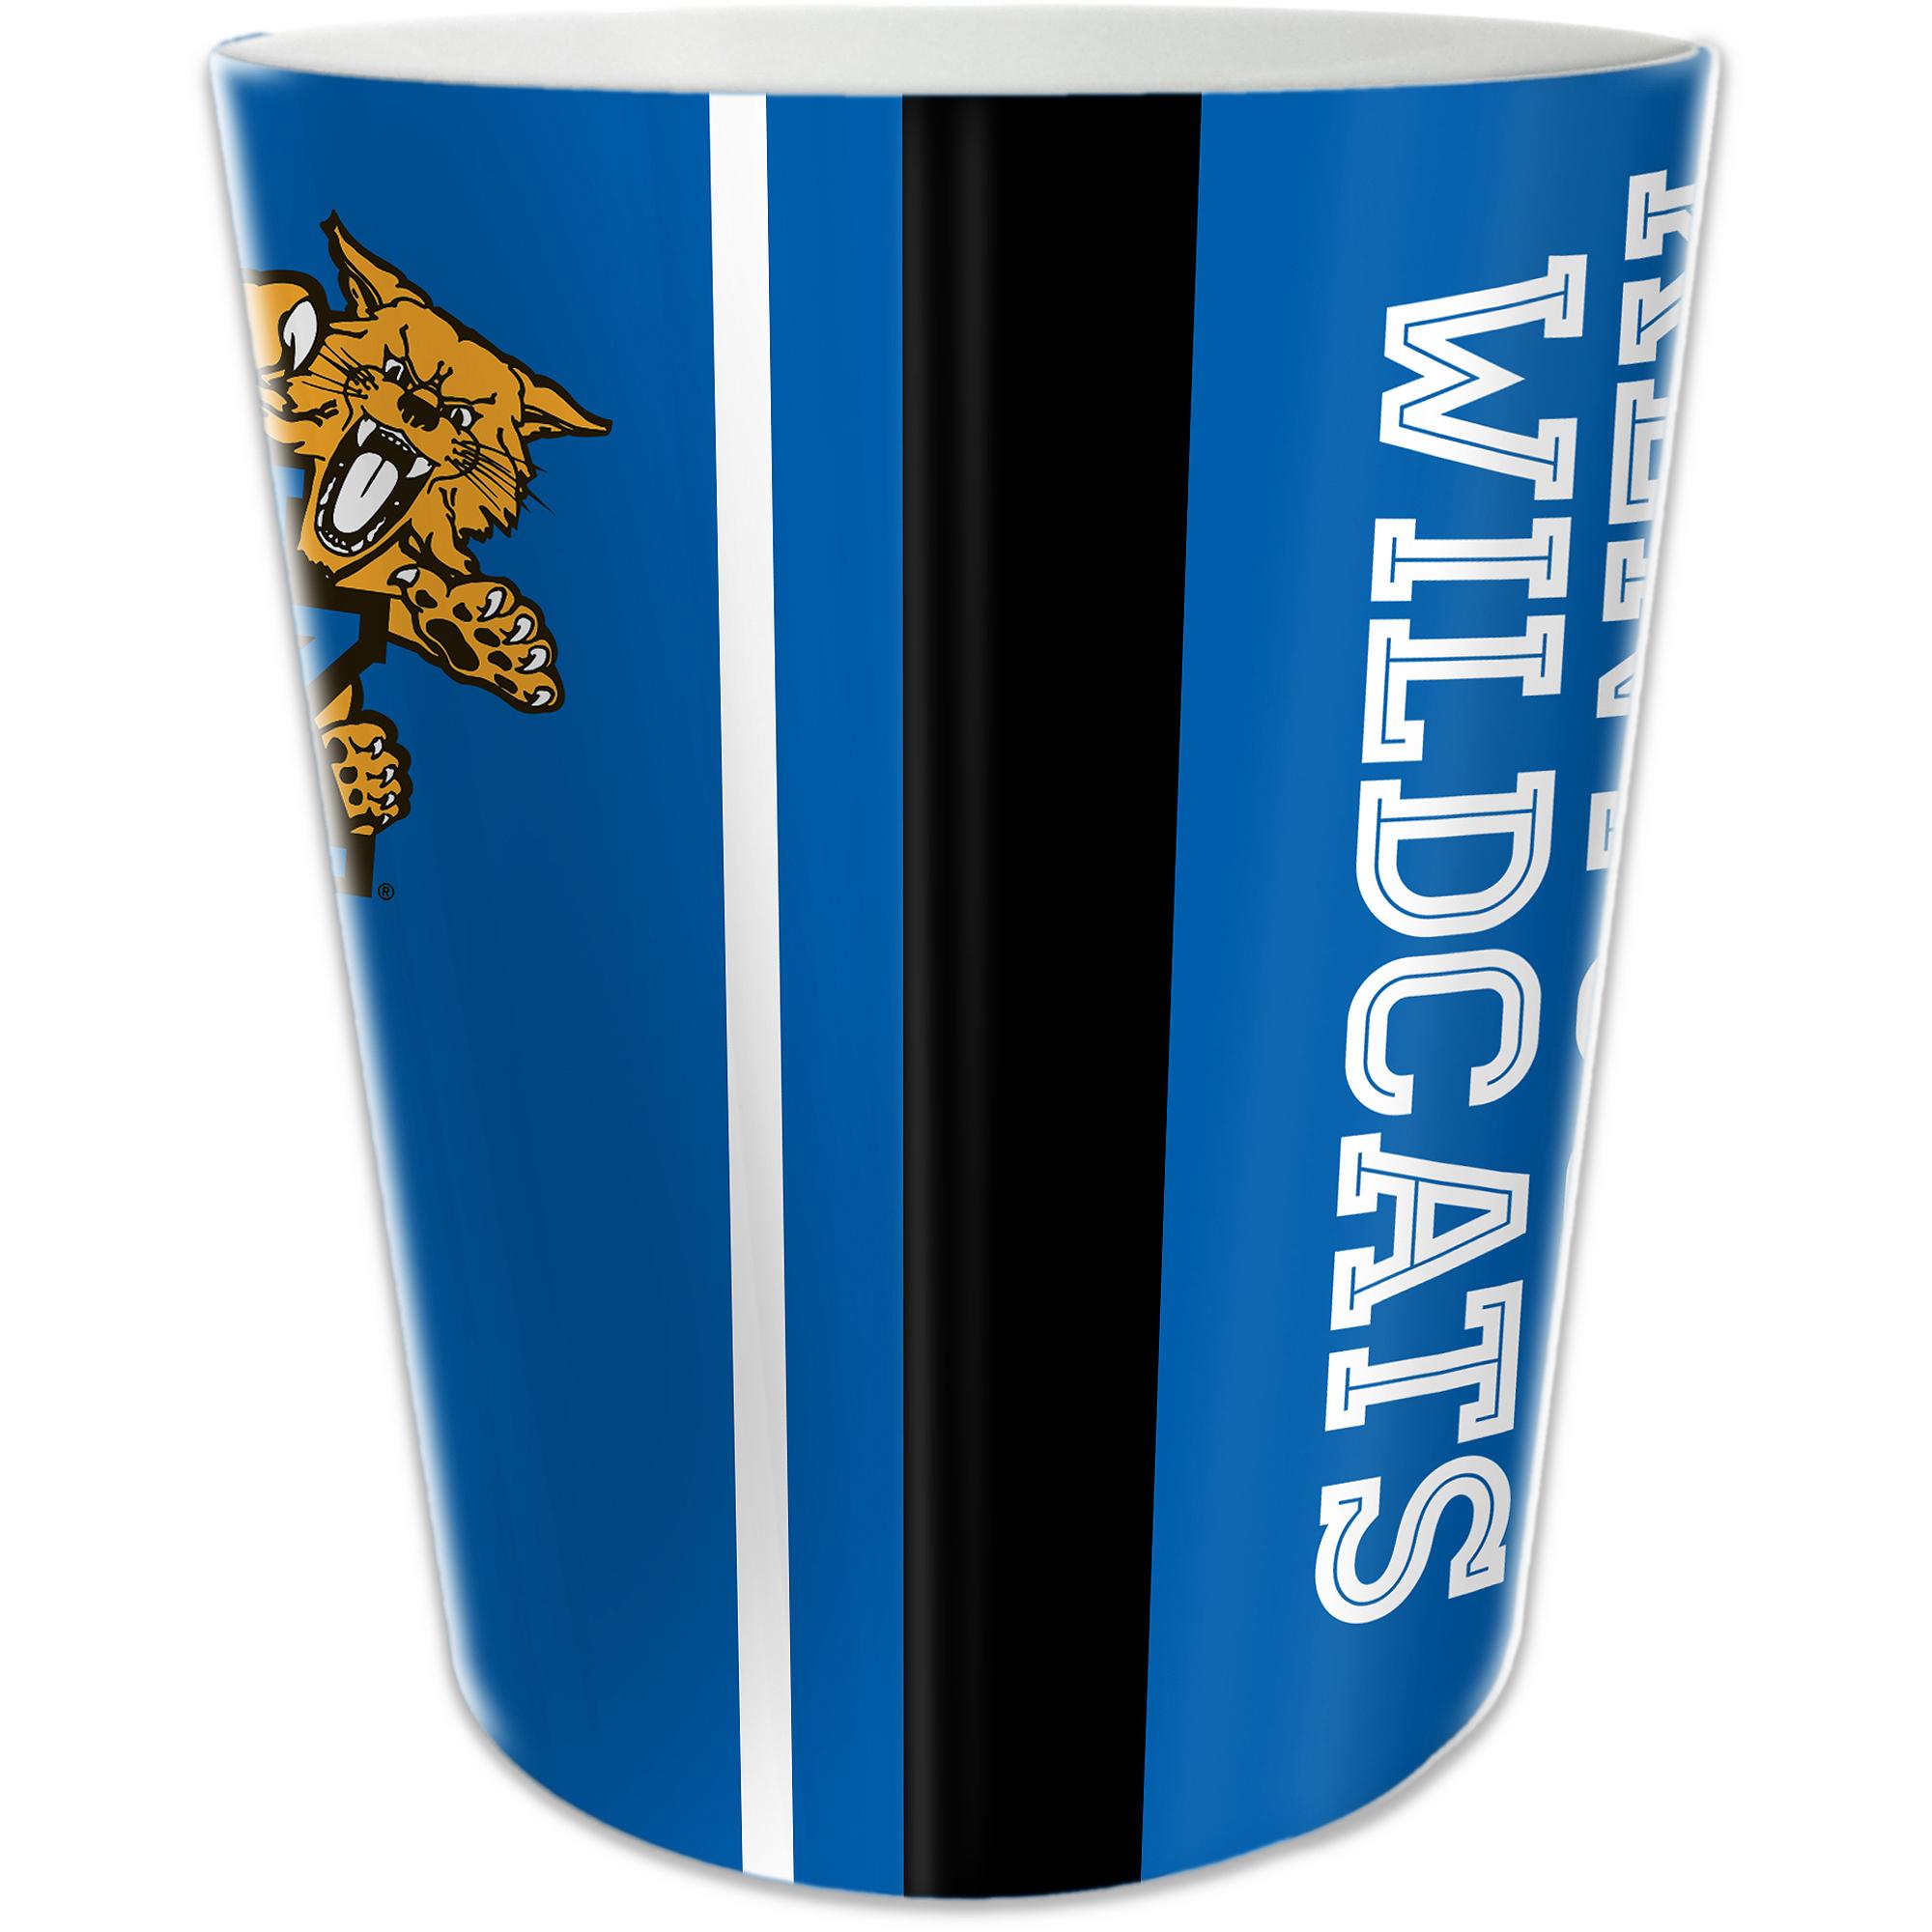 NCAA University of Kentucky Decorative Bath Collection - Wastecan